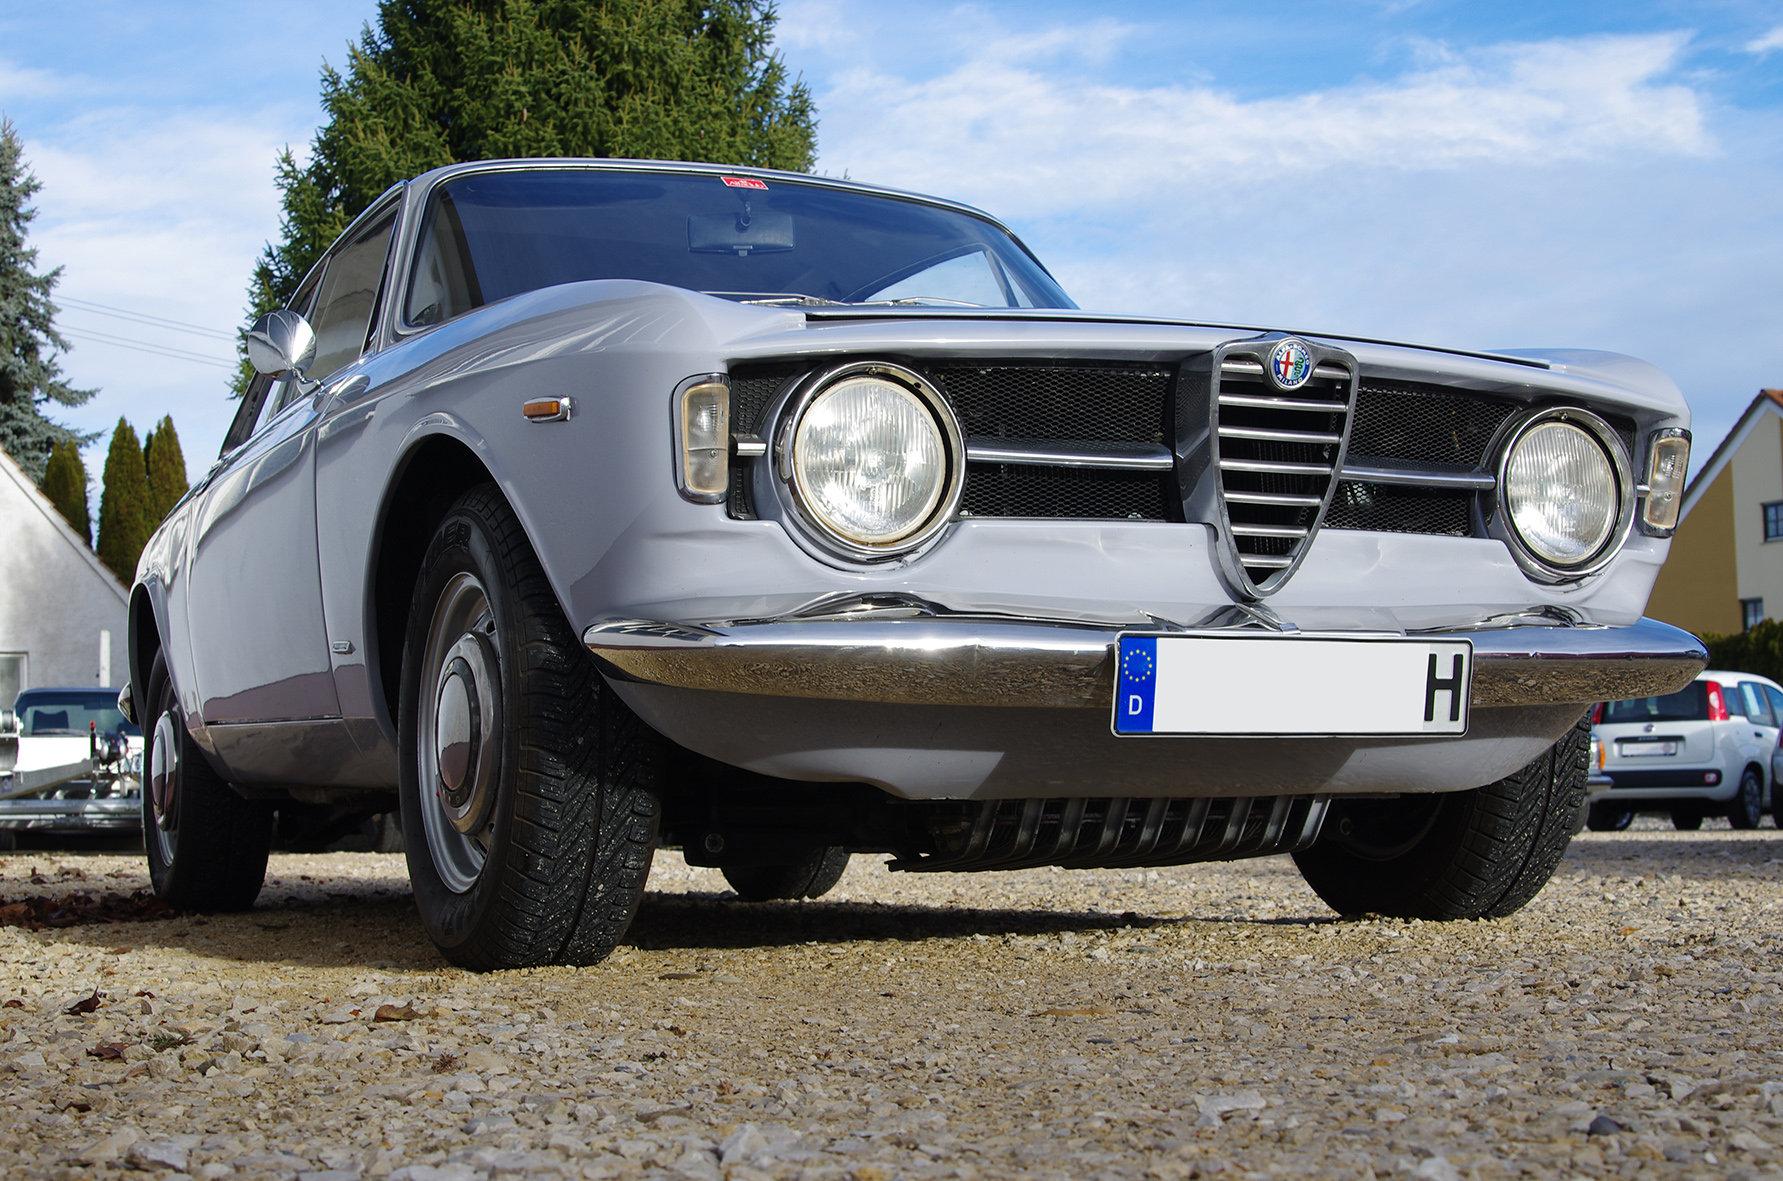 1967 Alfa Romeo Giulia GT 1300 Junior *restored* UK delivery poss SOLD (picture 5 of 6)